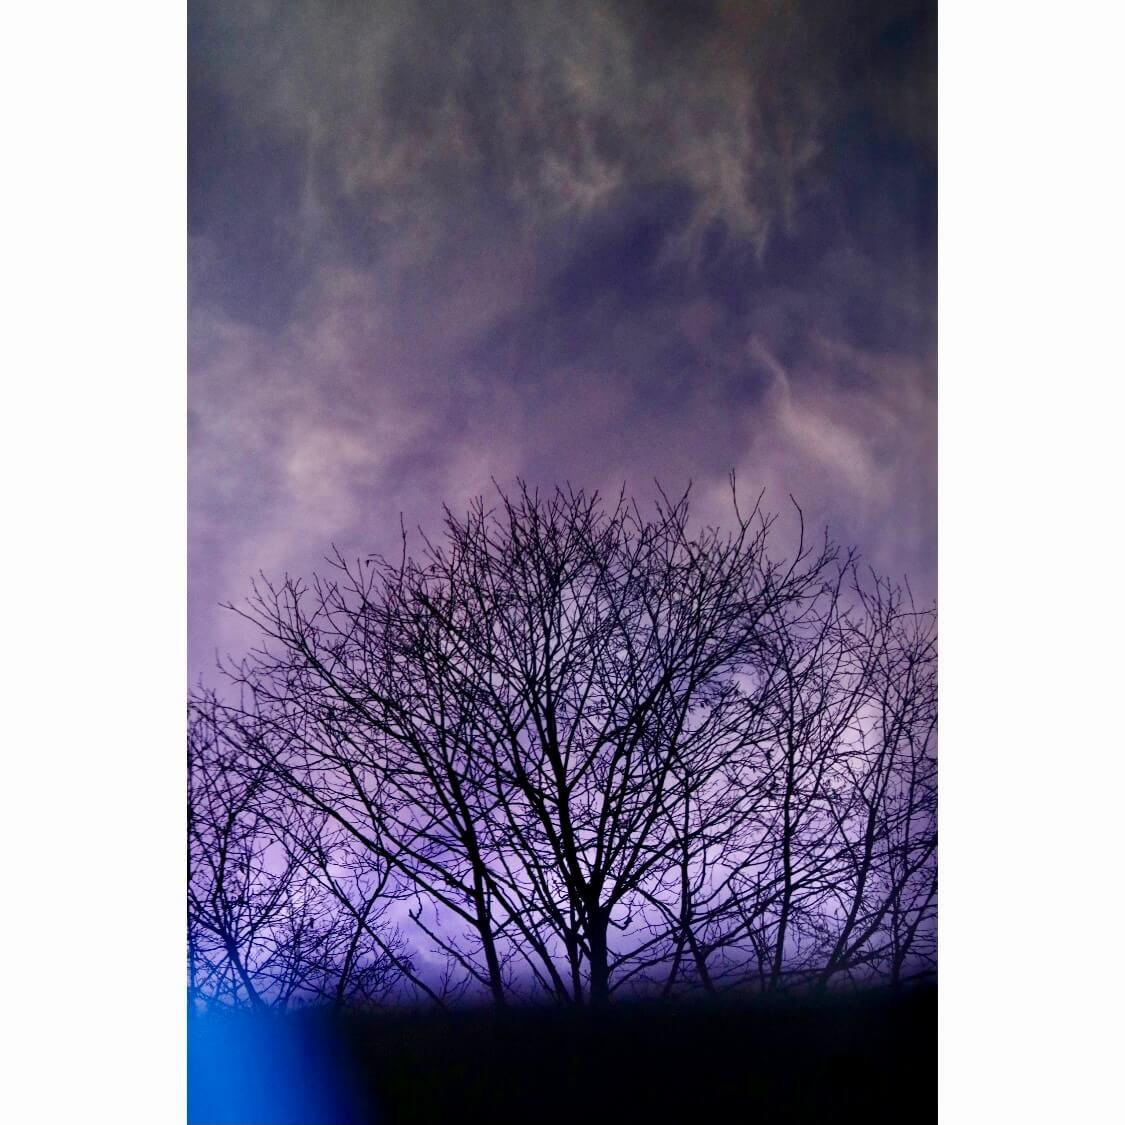 7AD504FC 4B84 46BB BD9E 34CA0A0DB28F - Brockwell Trees III by Adrian Flower